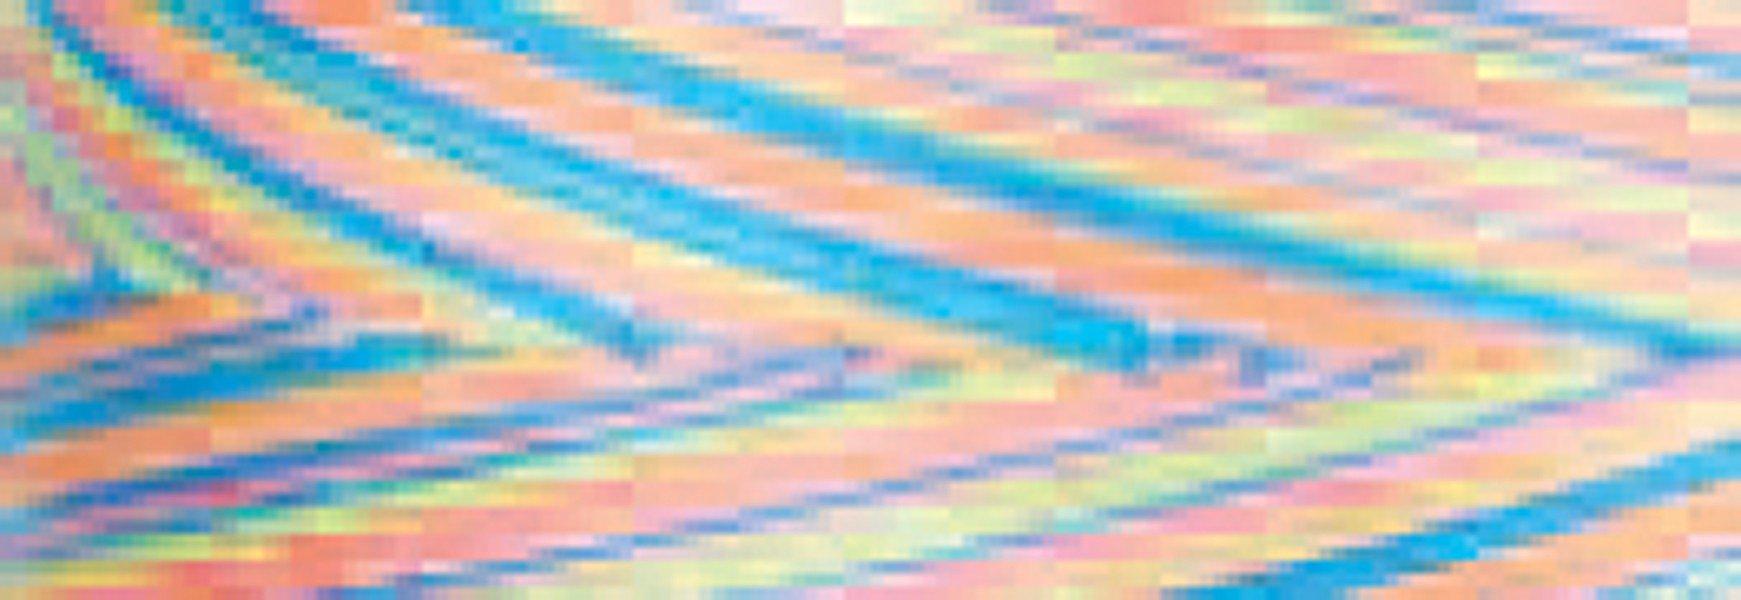 Cotton 40wt Thread 700yd - Variegated Summery Fun